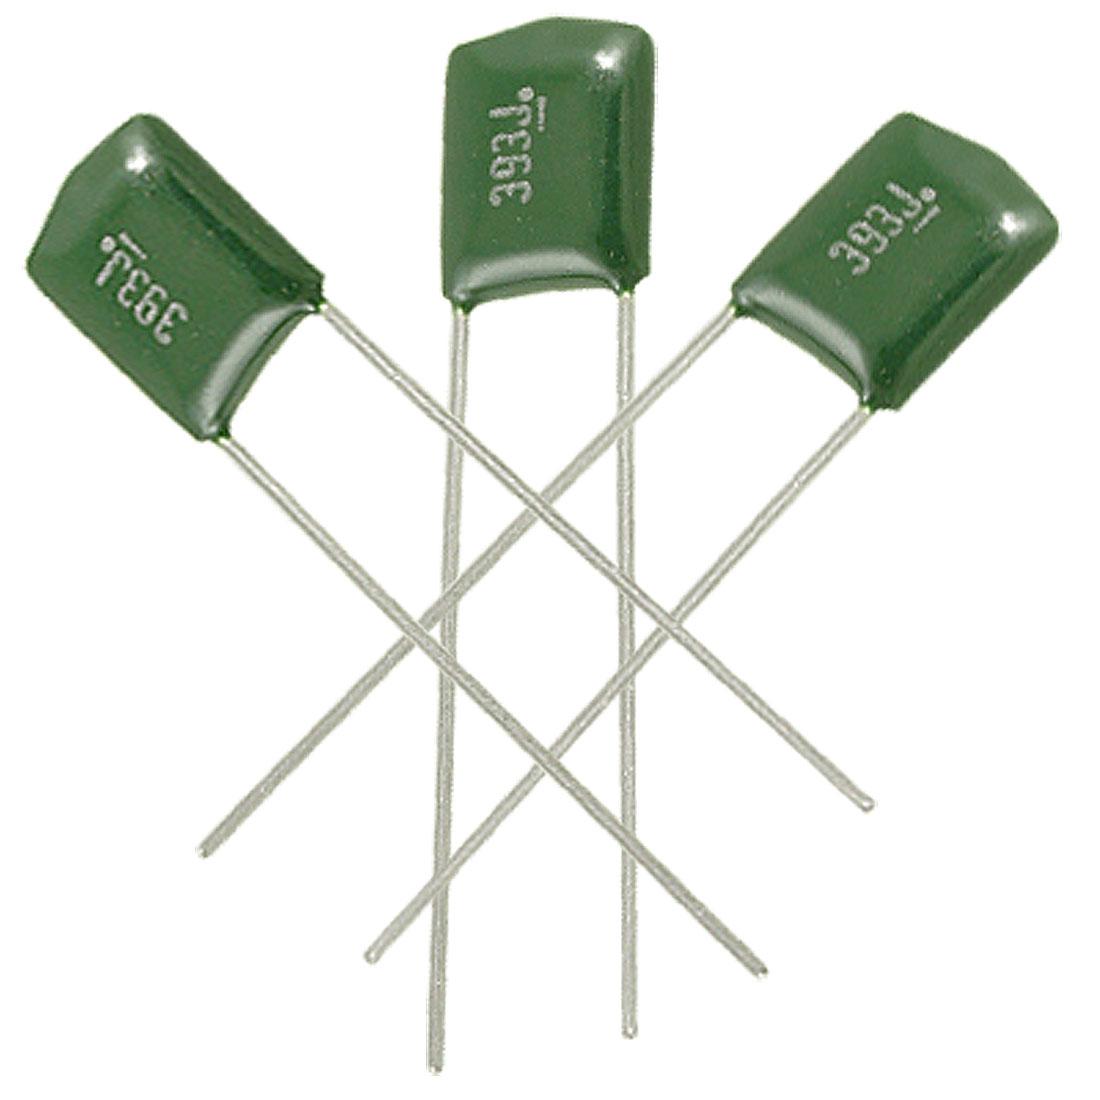 100 x DIP Radial Leads 0.039uF 5% 100V Polyester Film Mylar Capacitors